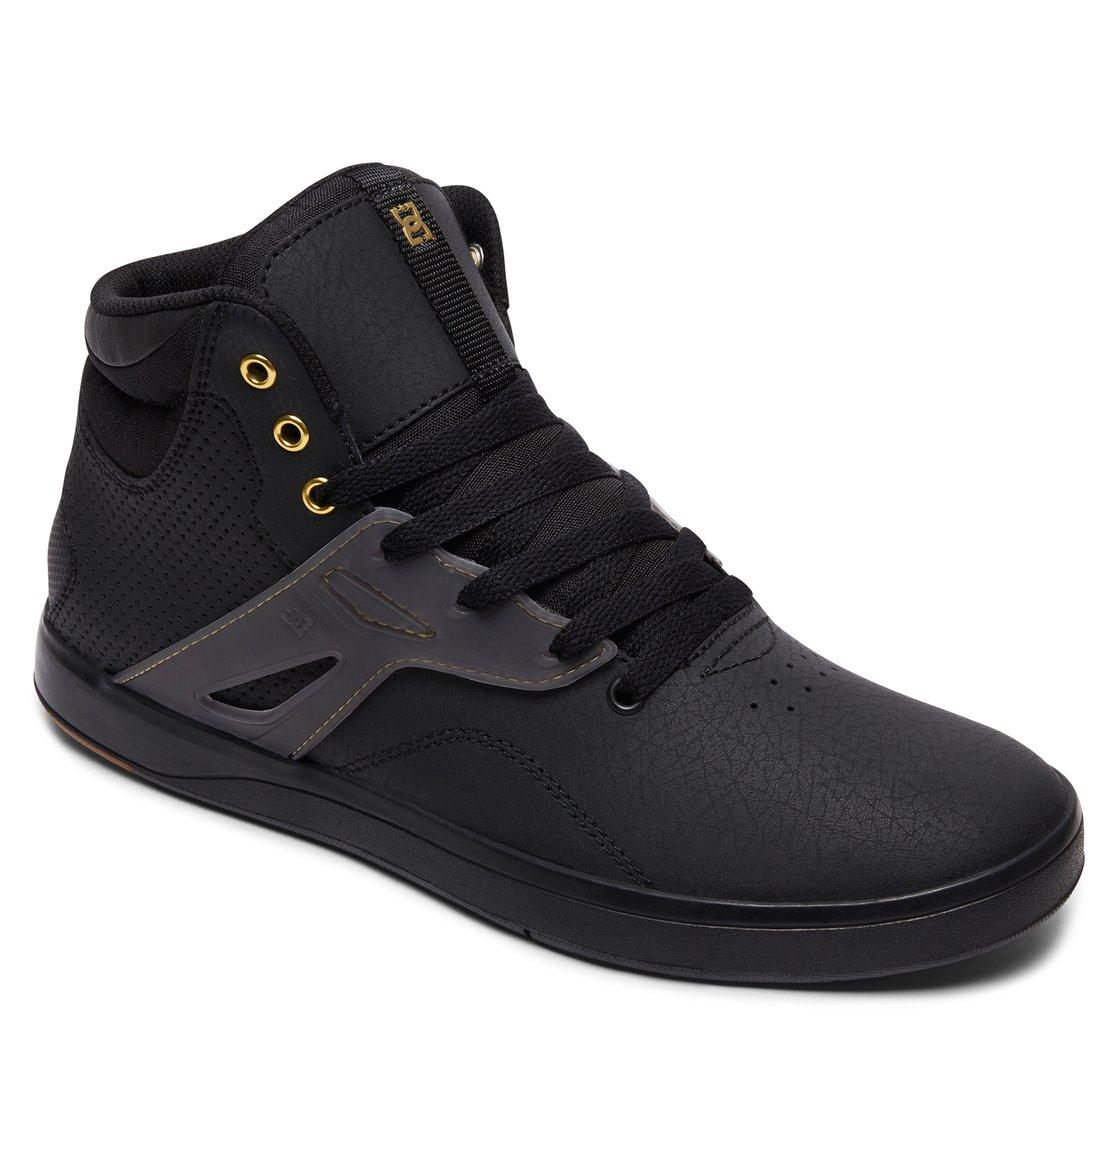 Black High Top Dc Shoes